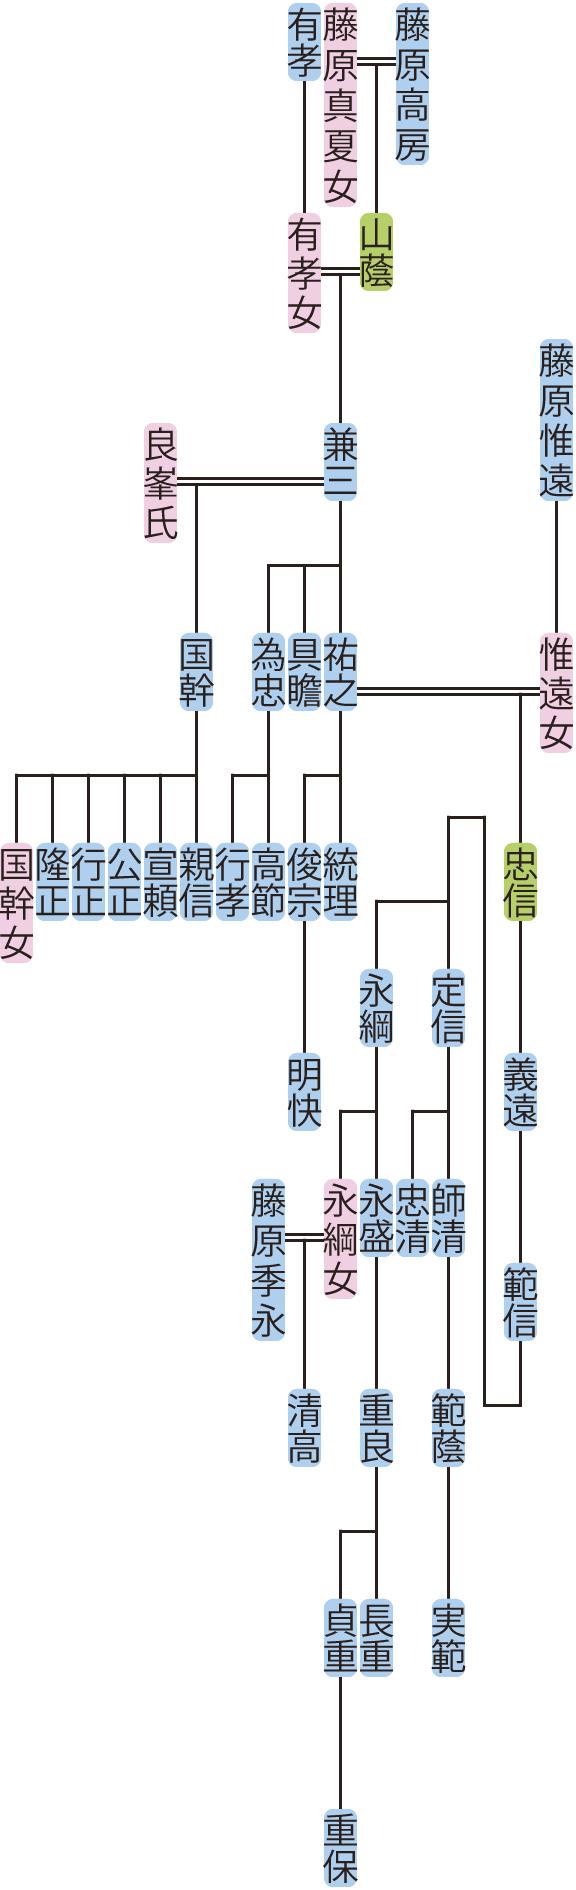 藤原兼三の系図